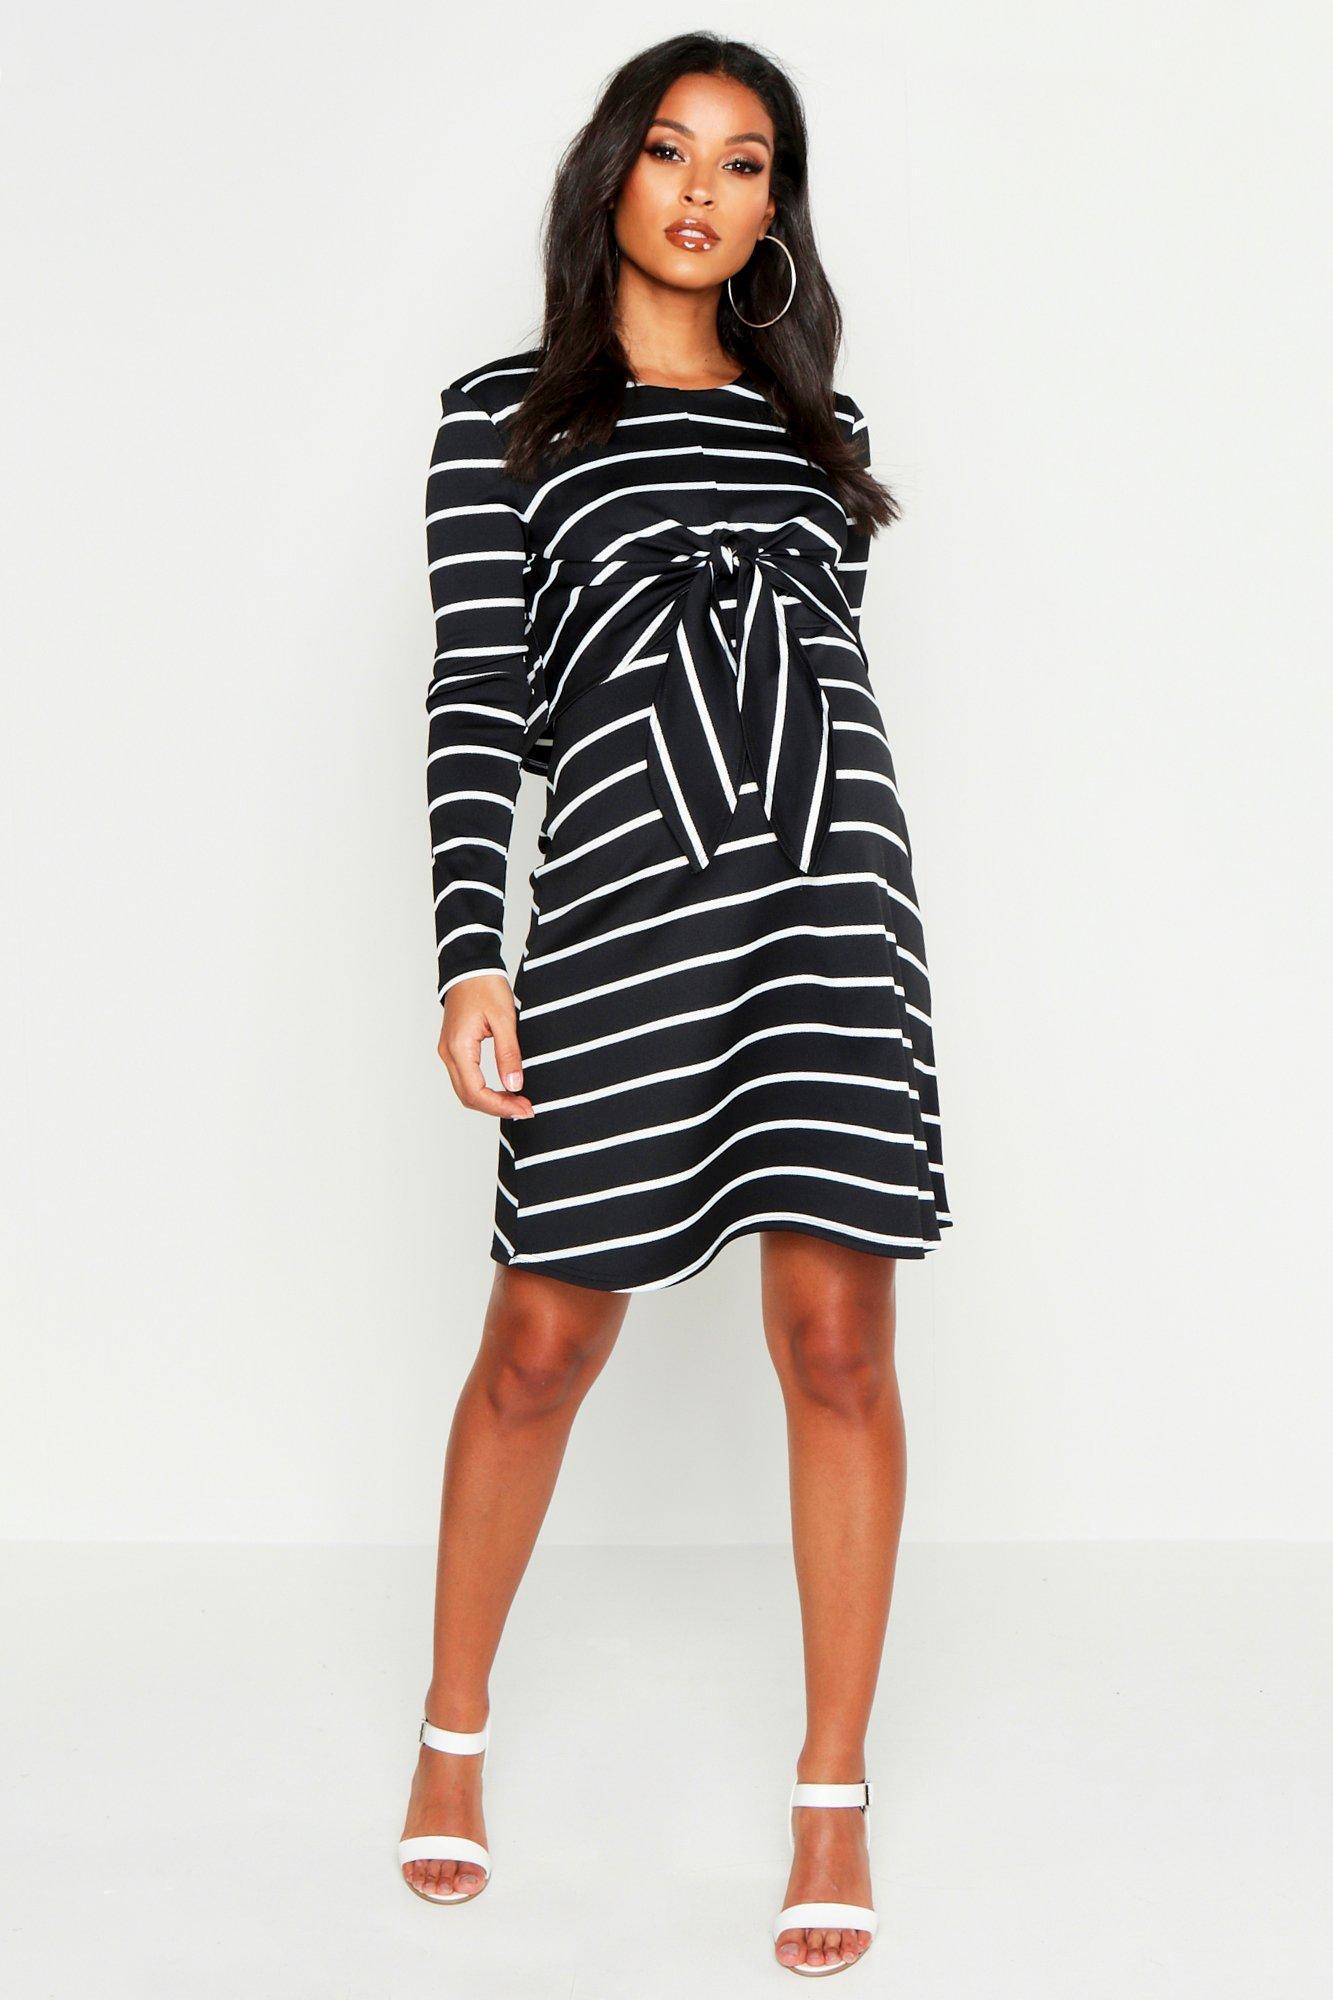 73e634526eec5 Boohoo. Women's Maternity Nursing Knot Front Stripe Dress